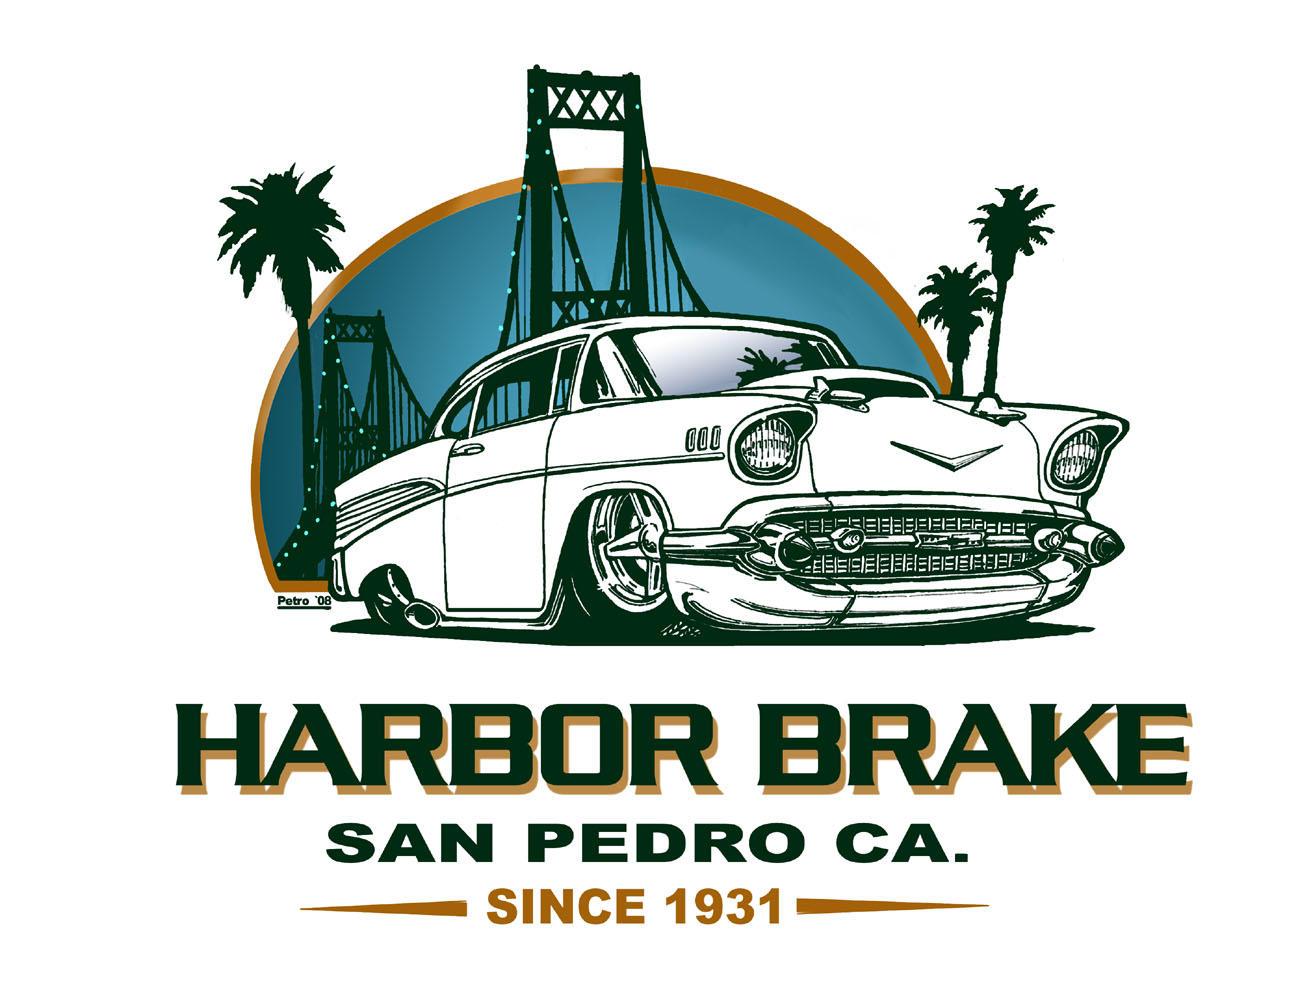 Harbor Brake & Automotive Service